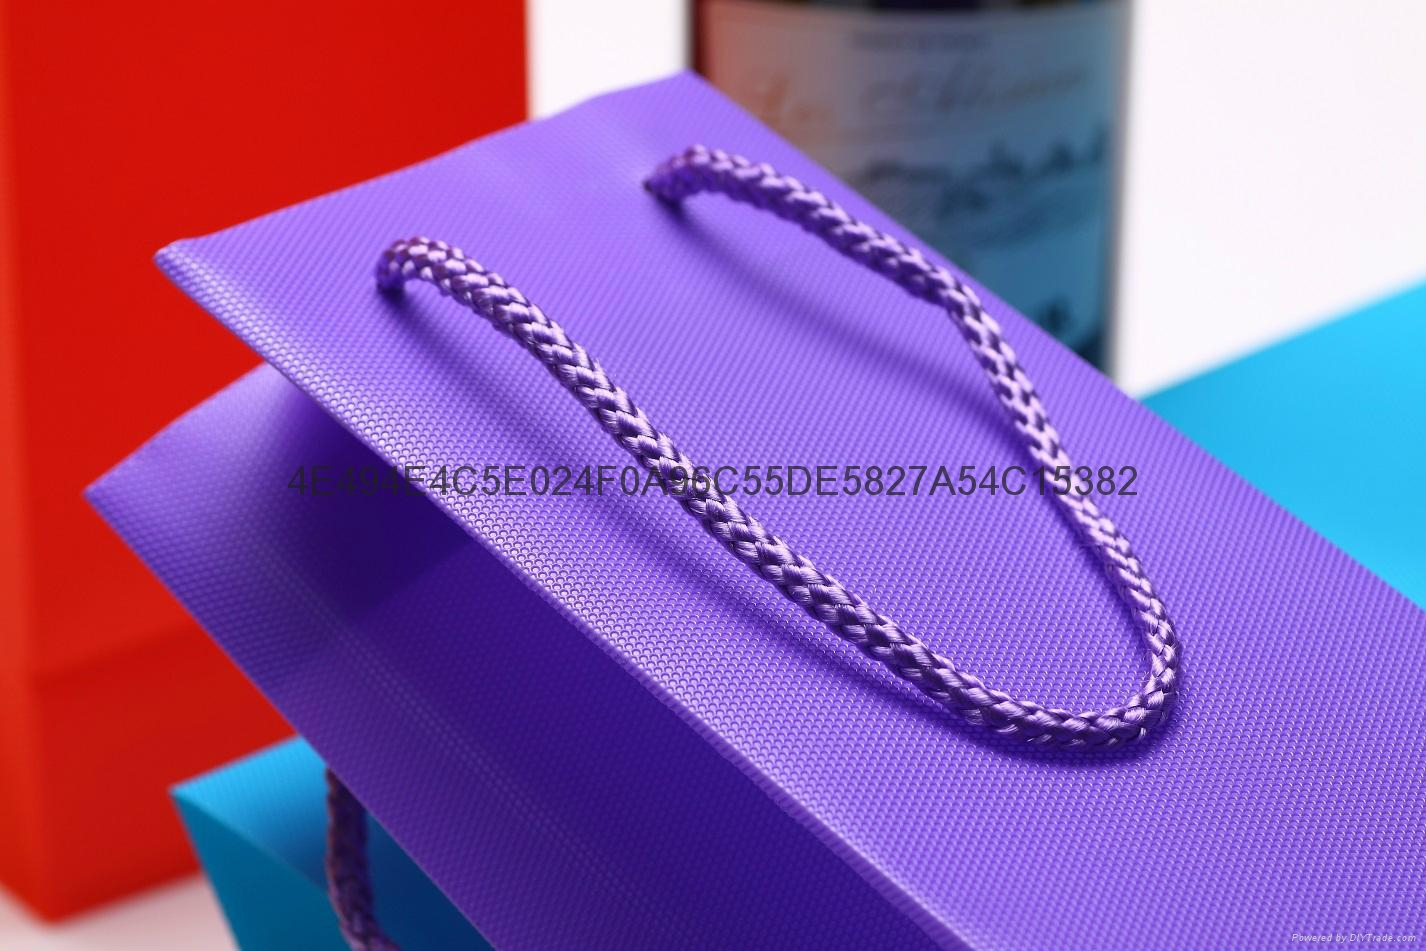 Fancy Waterproof Hexagonal Pattern Wine Gift Promotion Bag PP Plastic Jute Bag  5